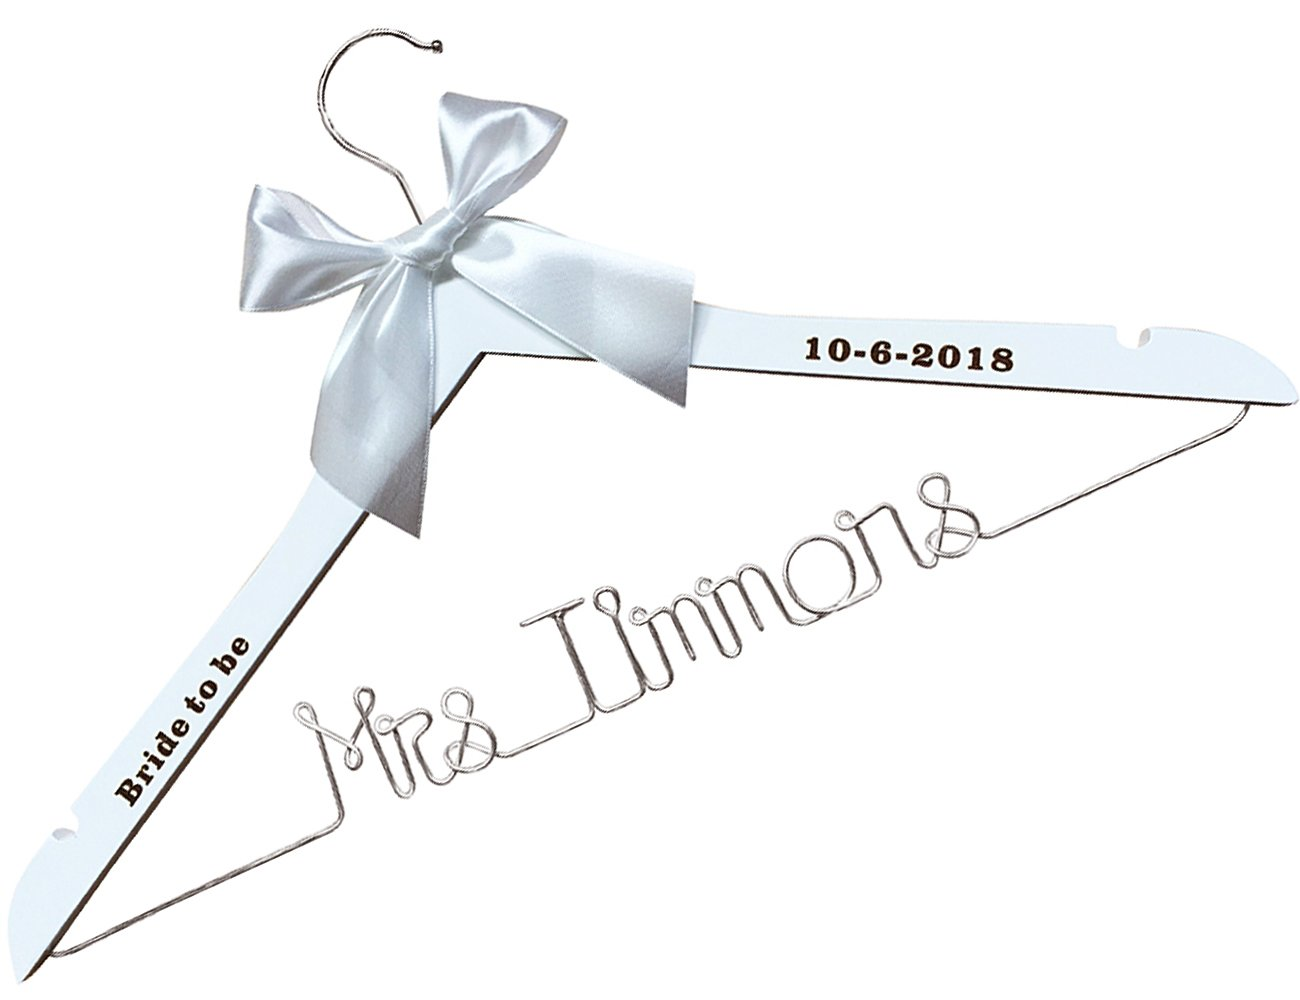 Custom Bridal Hanger-Wededing,Bridal Hanger one line, Brides Hanger Bride Name Hanger Wedding Hanger Personalized Bridal Gift-Custom it etnecklace